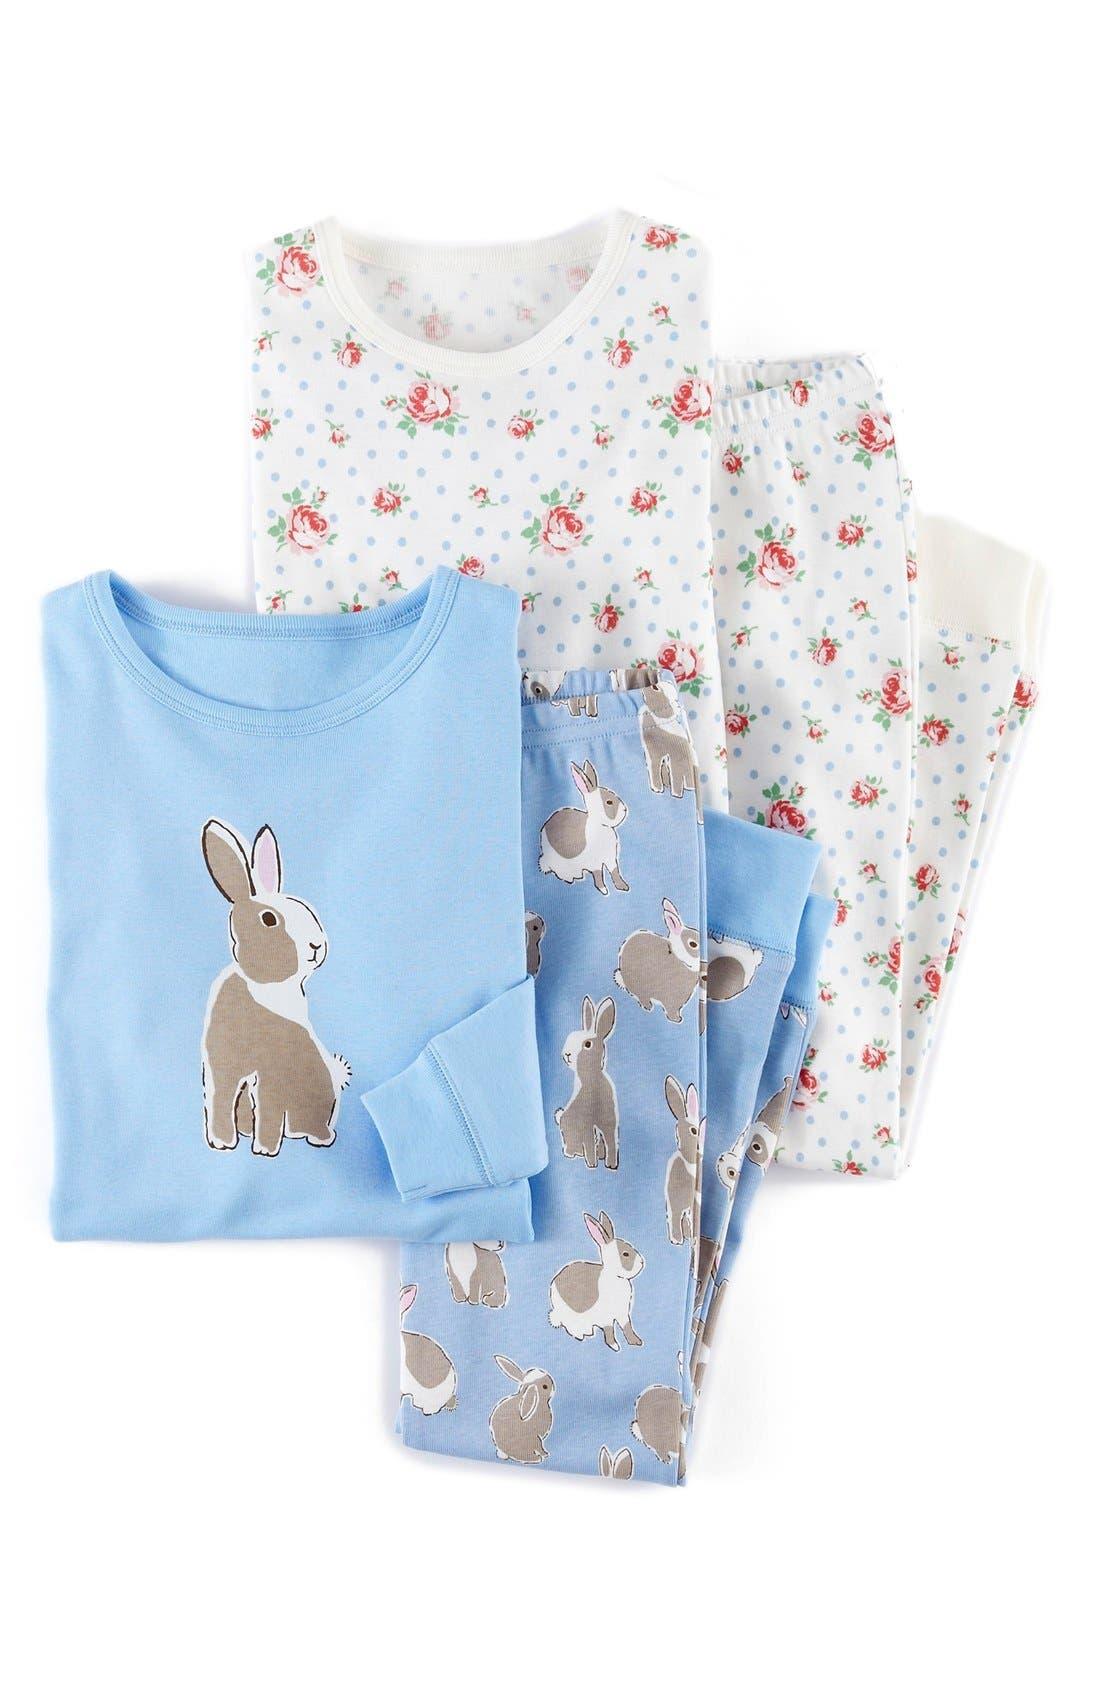 Alternate Image 1 Selected - Mini Boden Snug Fit Pajamas (2-Pack) (Toddler Girls, Little Girls & Big Girls)